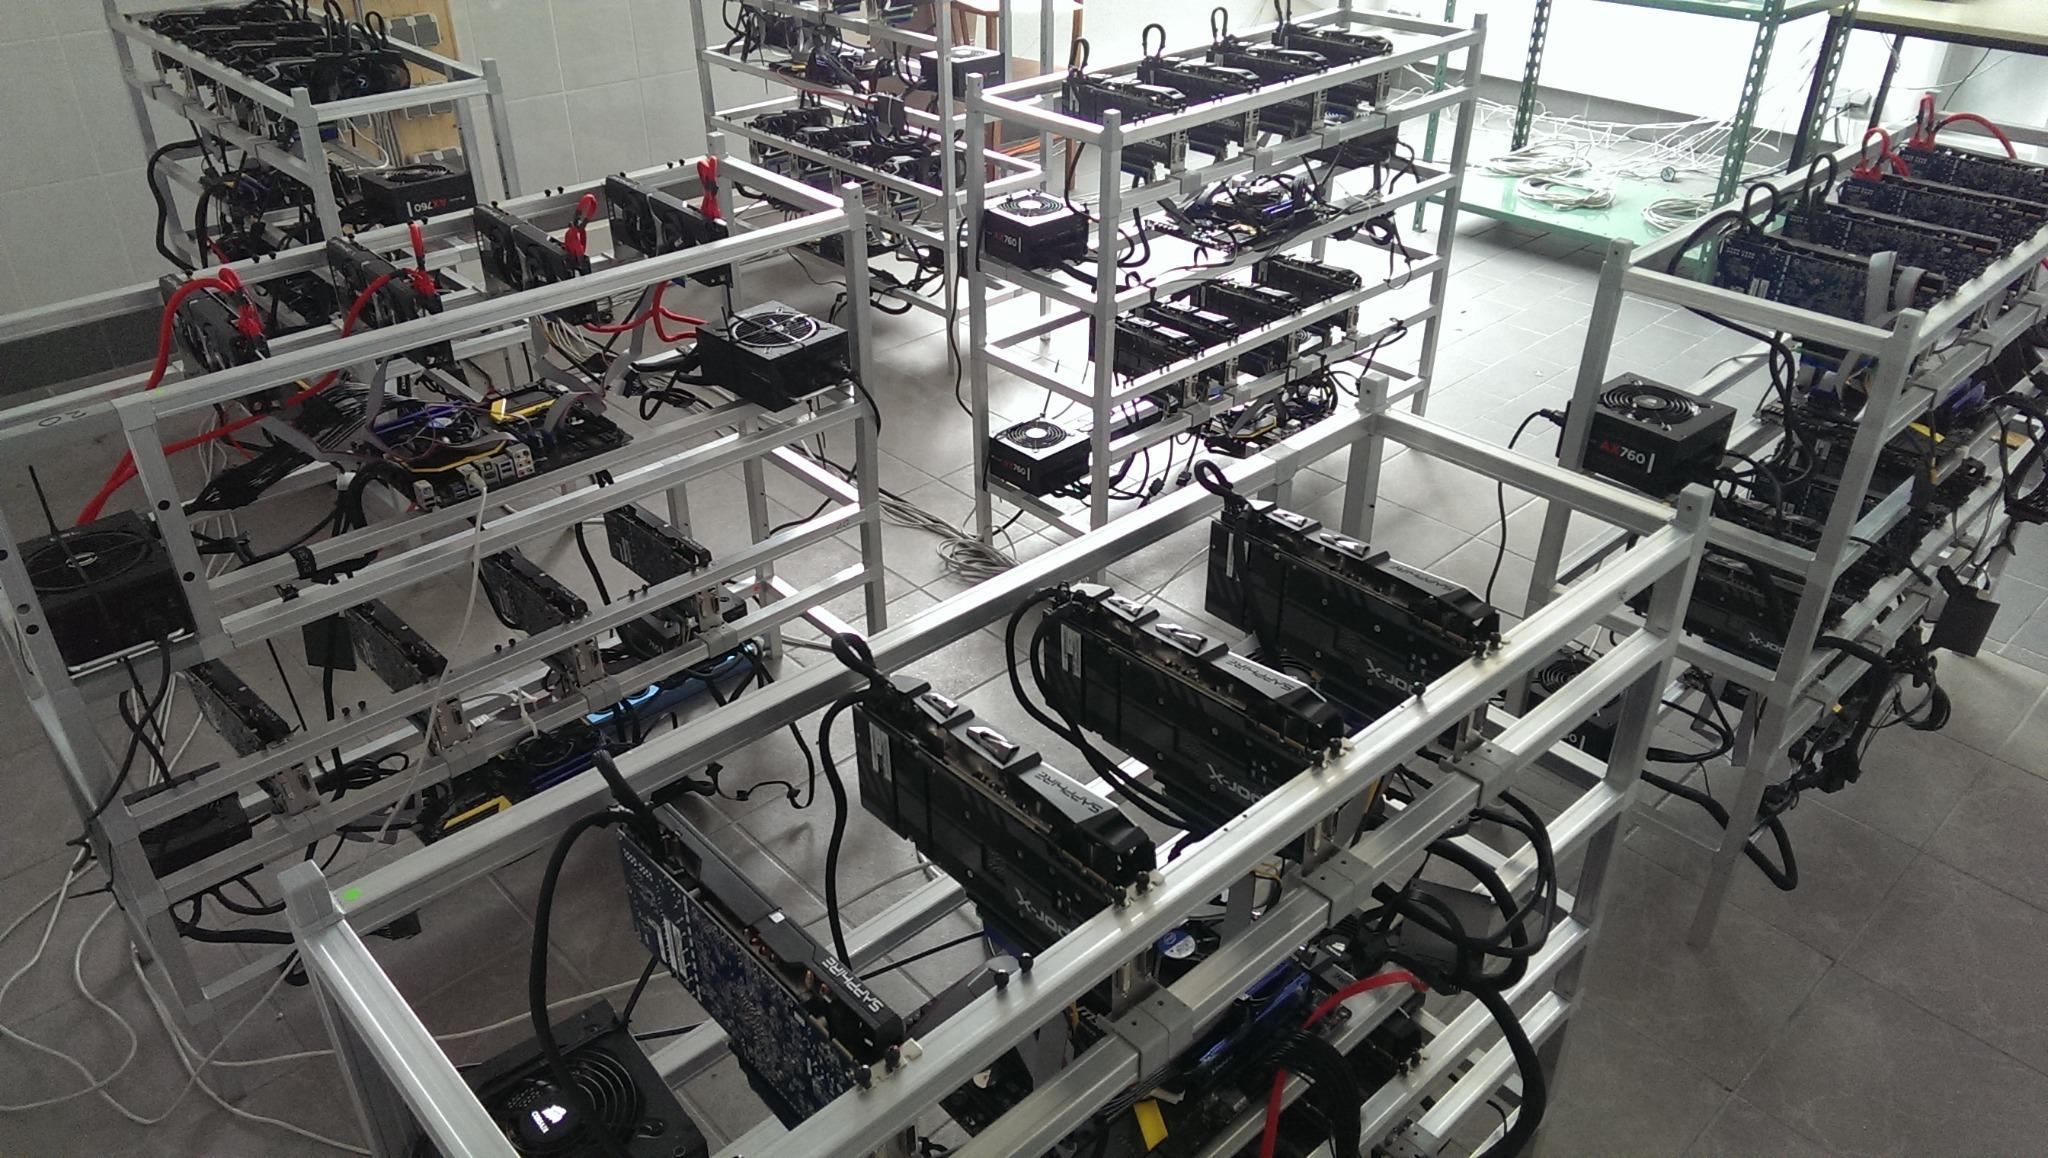 GPU for Bitcoin Mining 2019 - insuranzpro.com